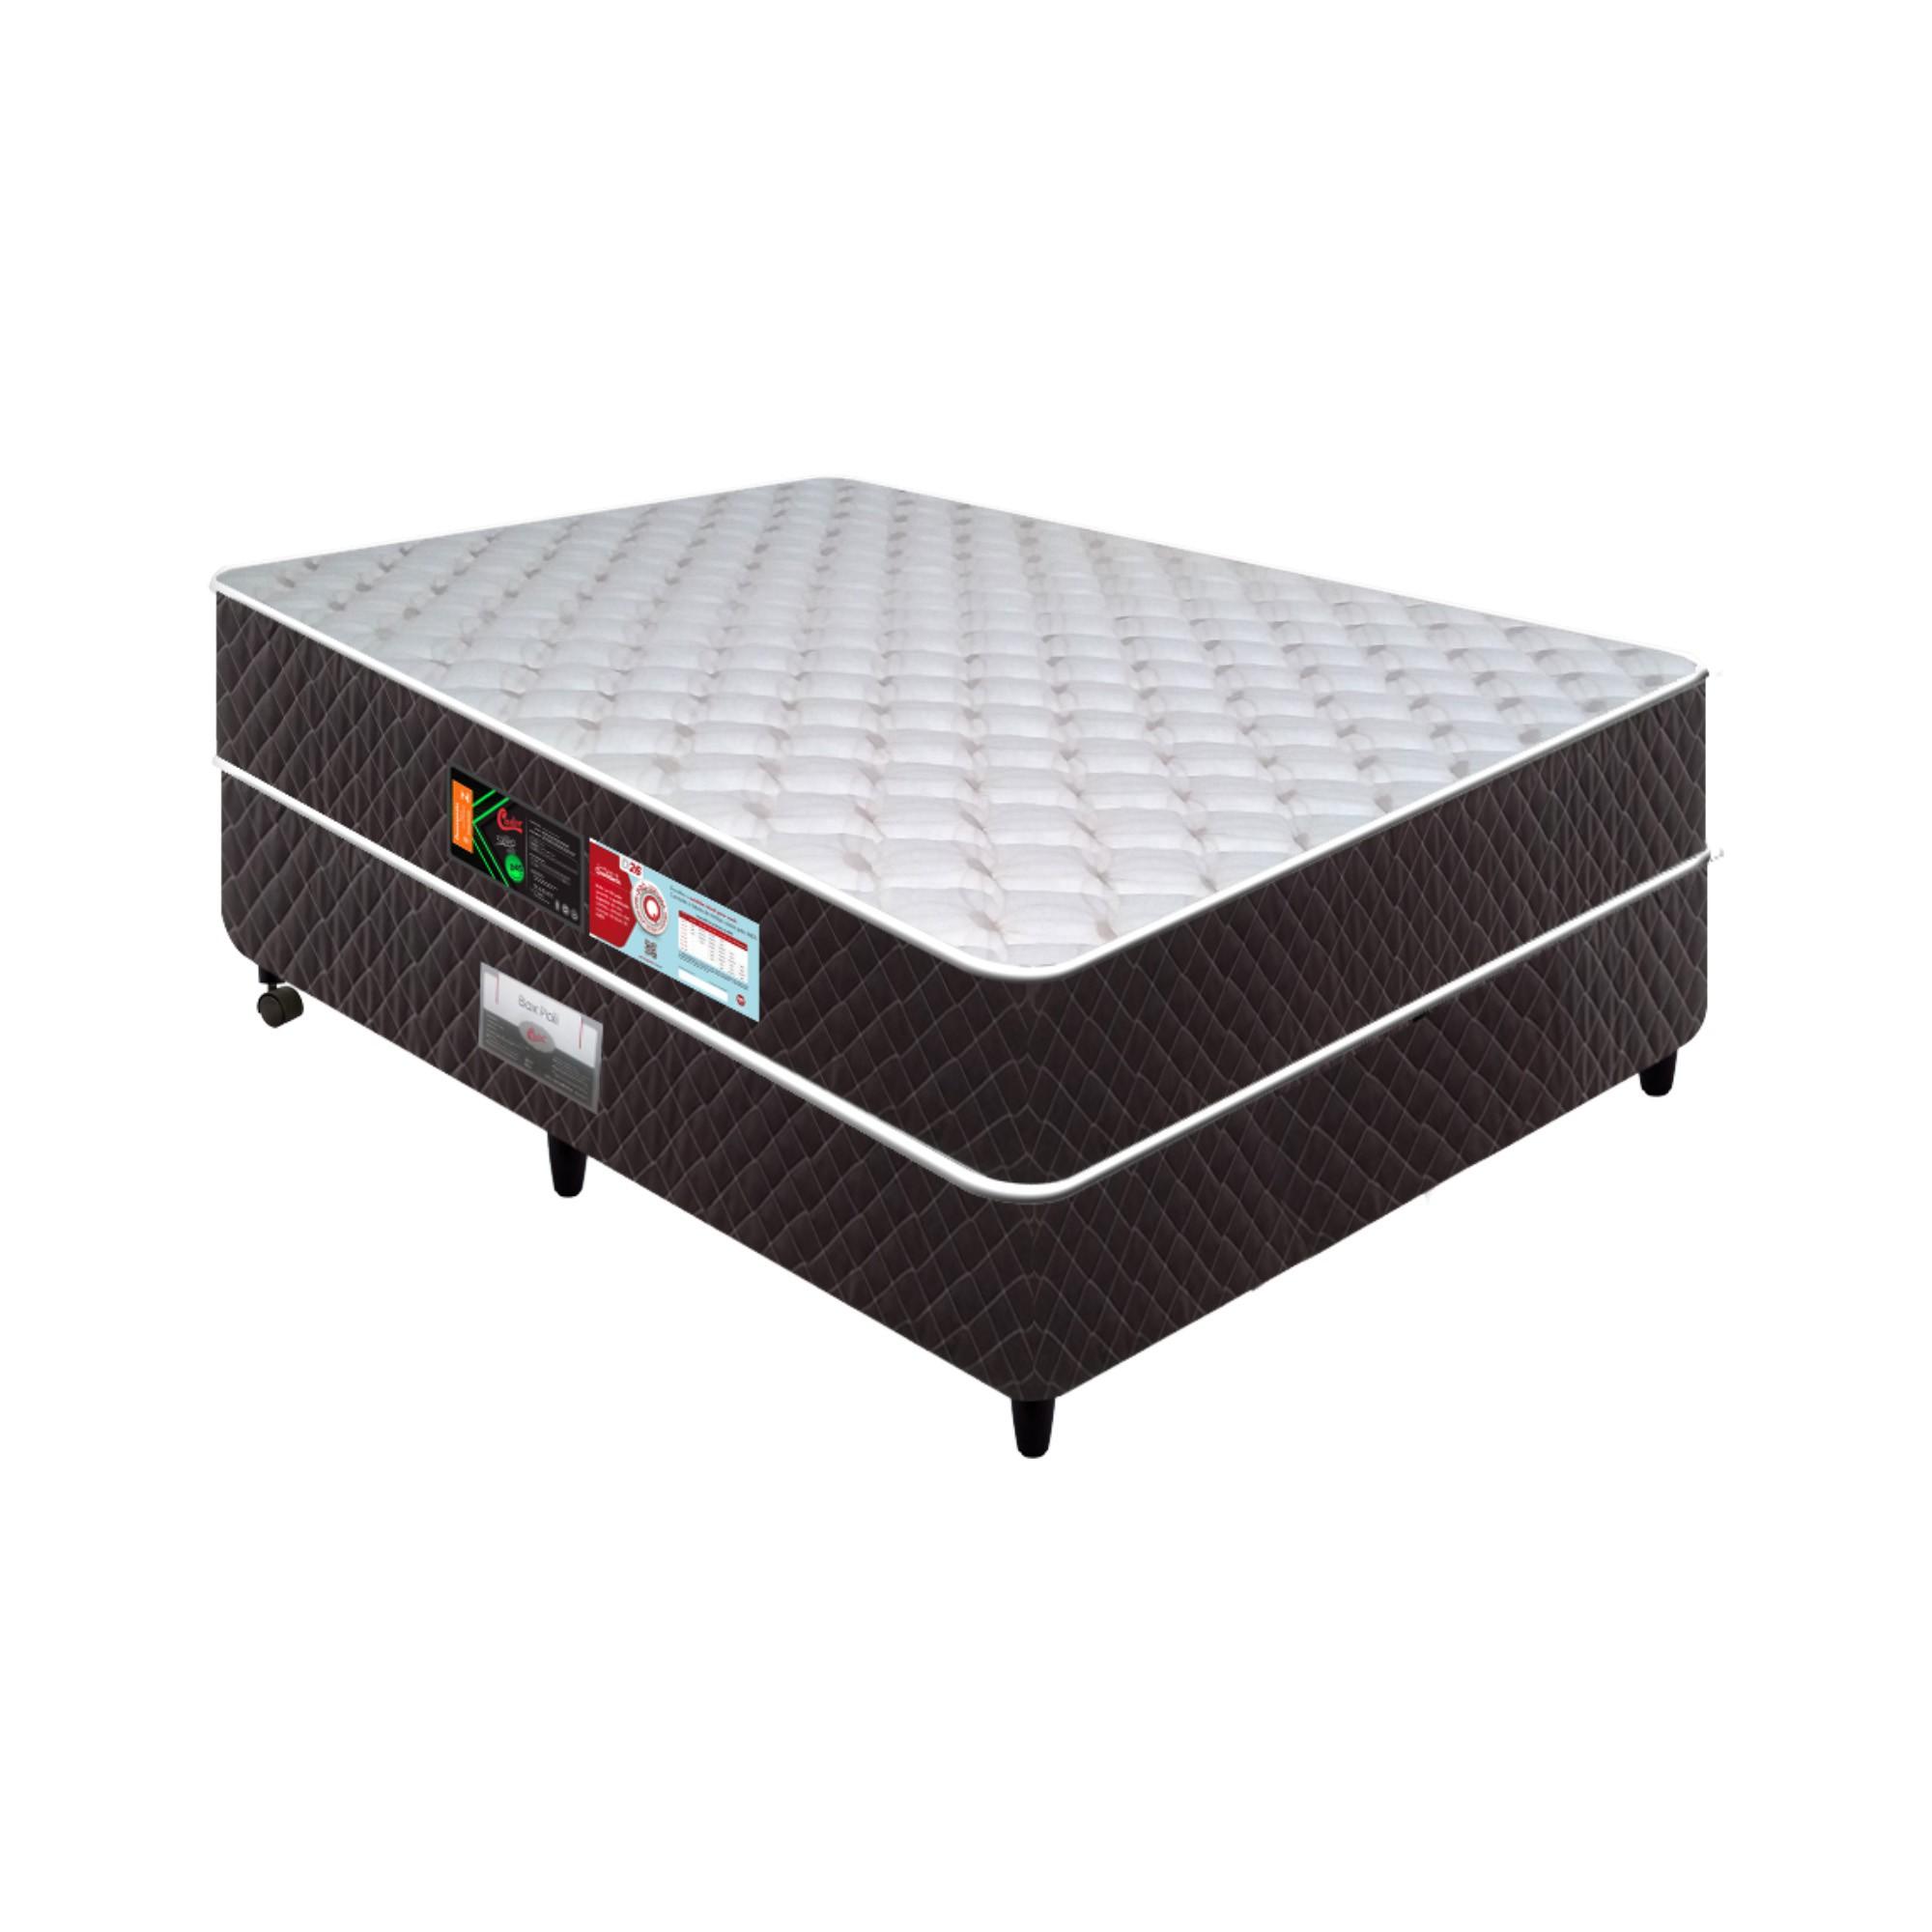 Conjunto Box Castor Sleep Max D28 [Viúva 128 x 188 cm]